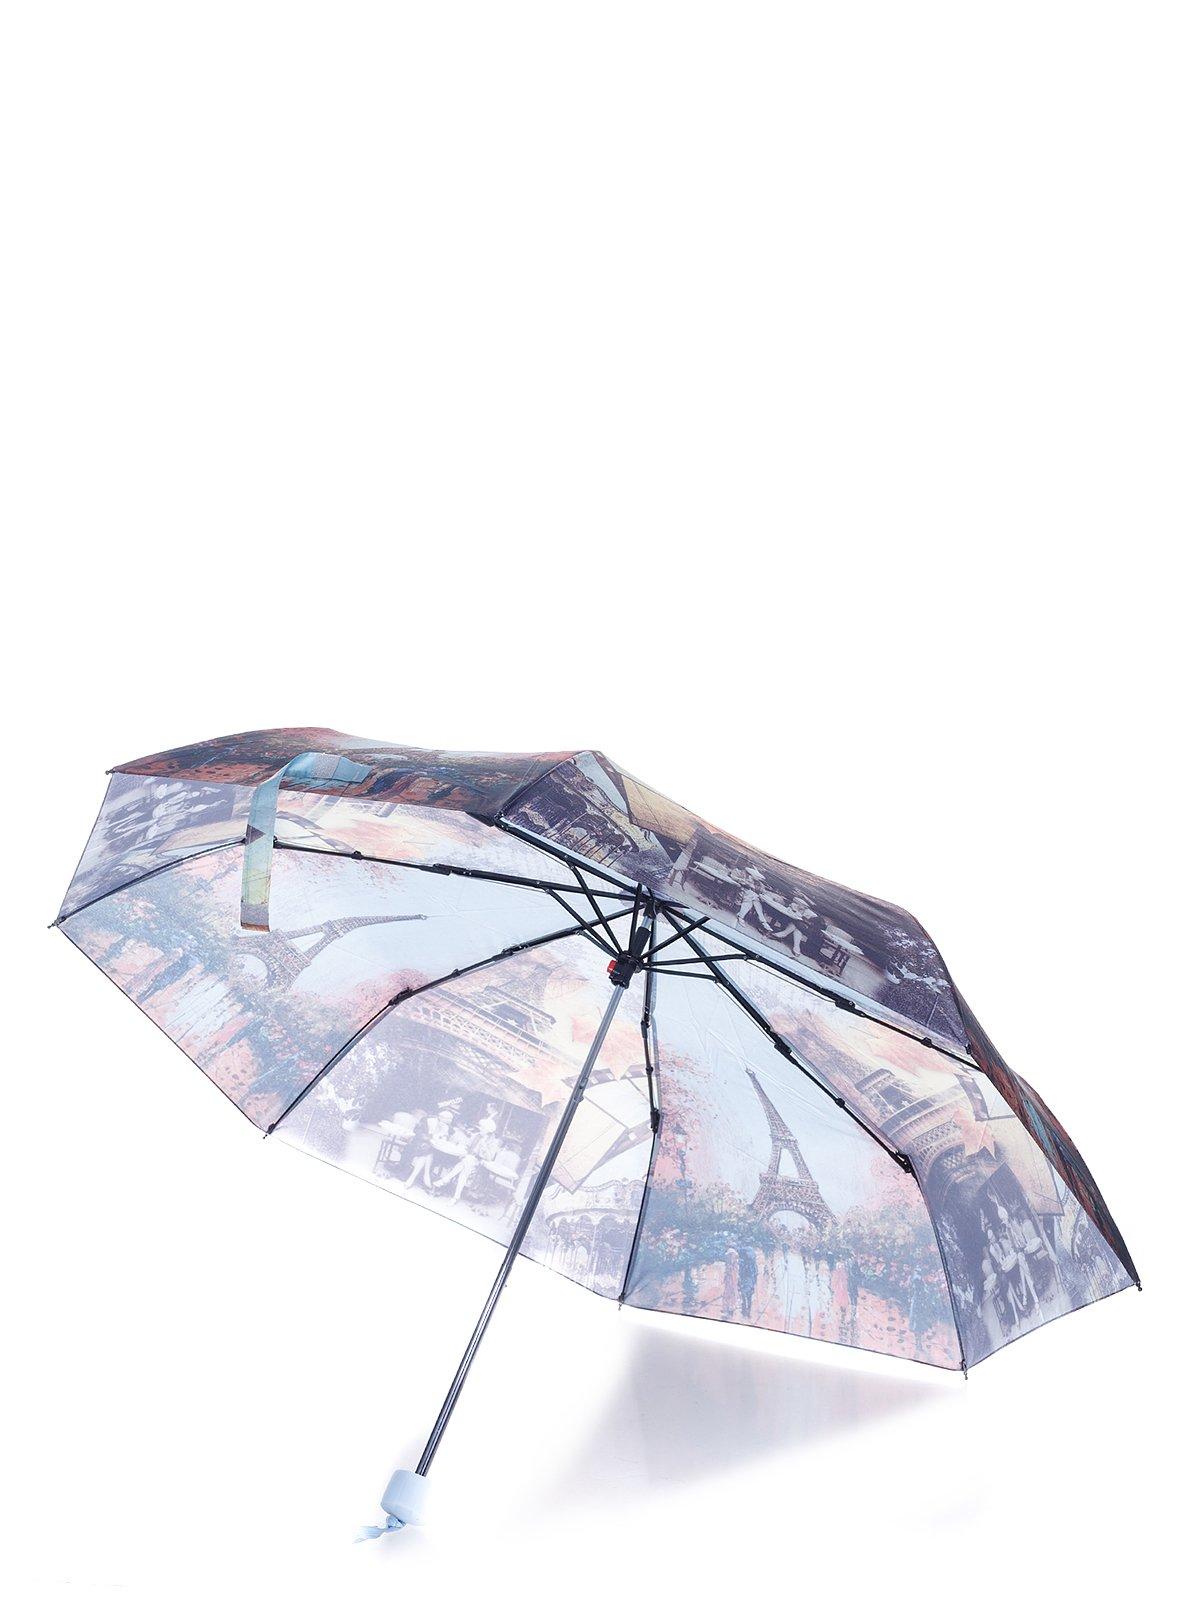 Зонт | 3754570 | фото 2